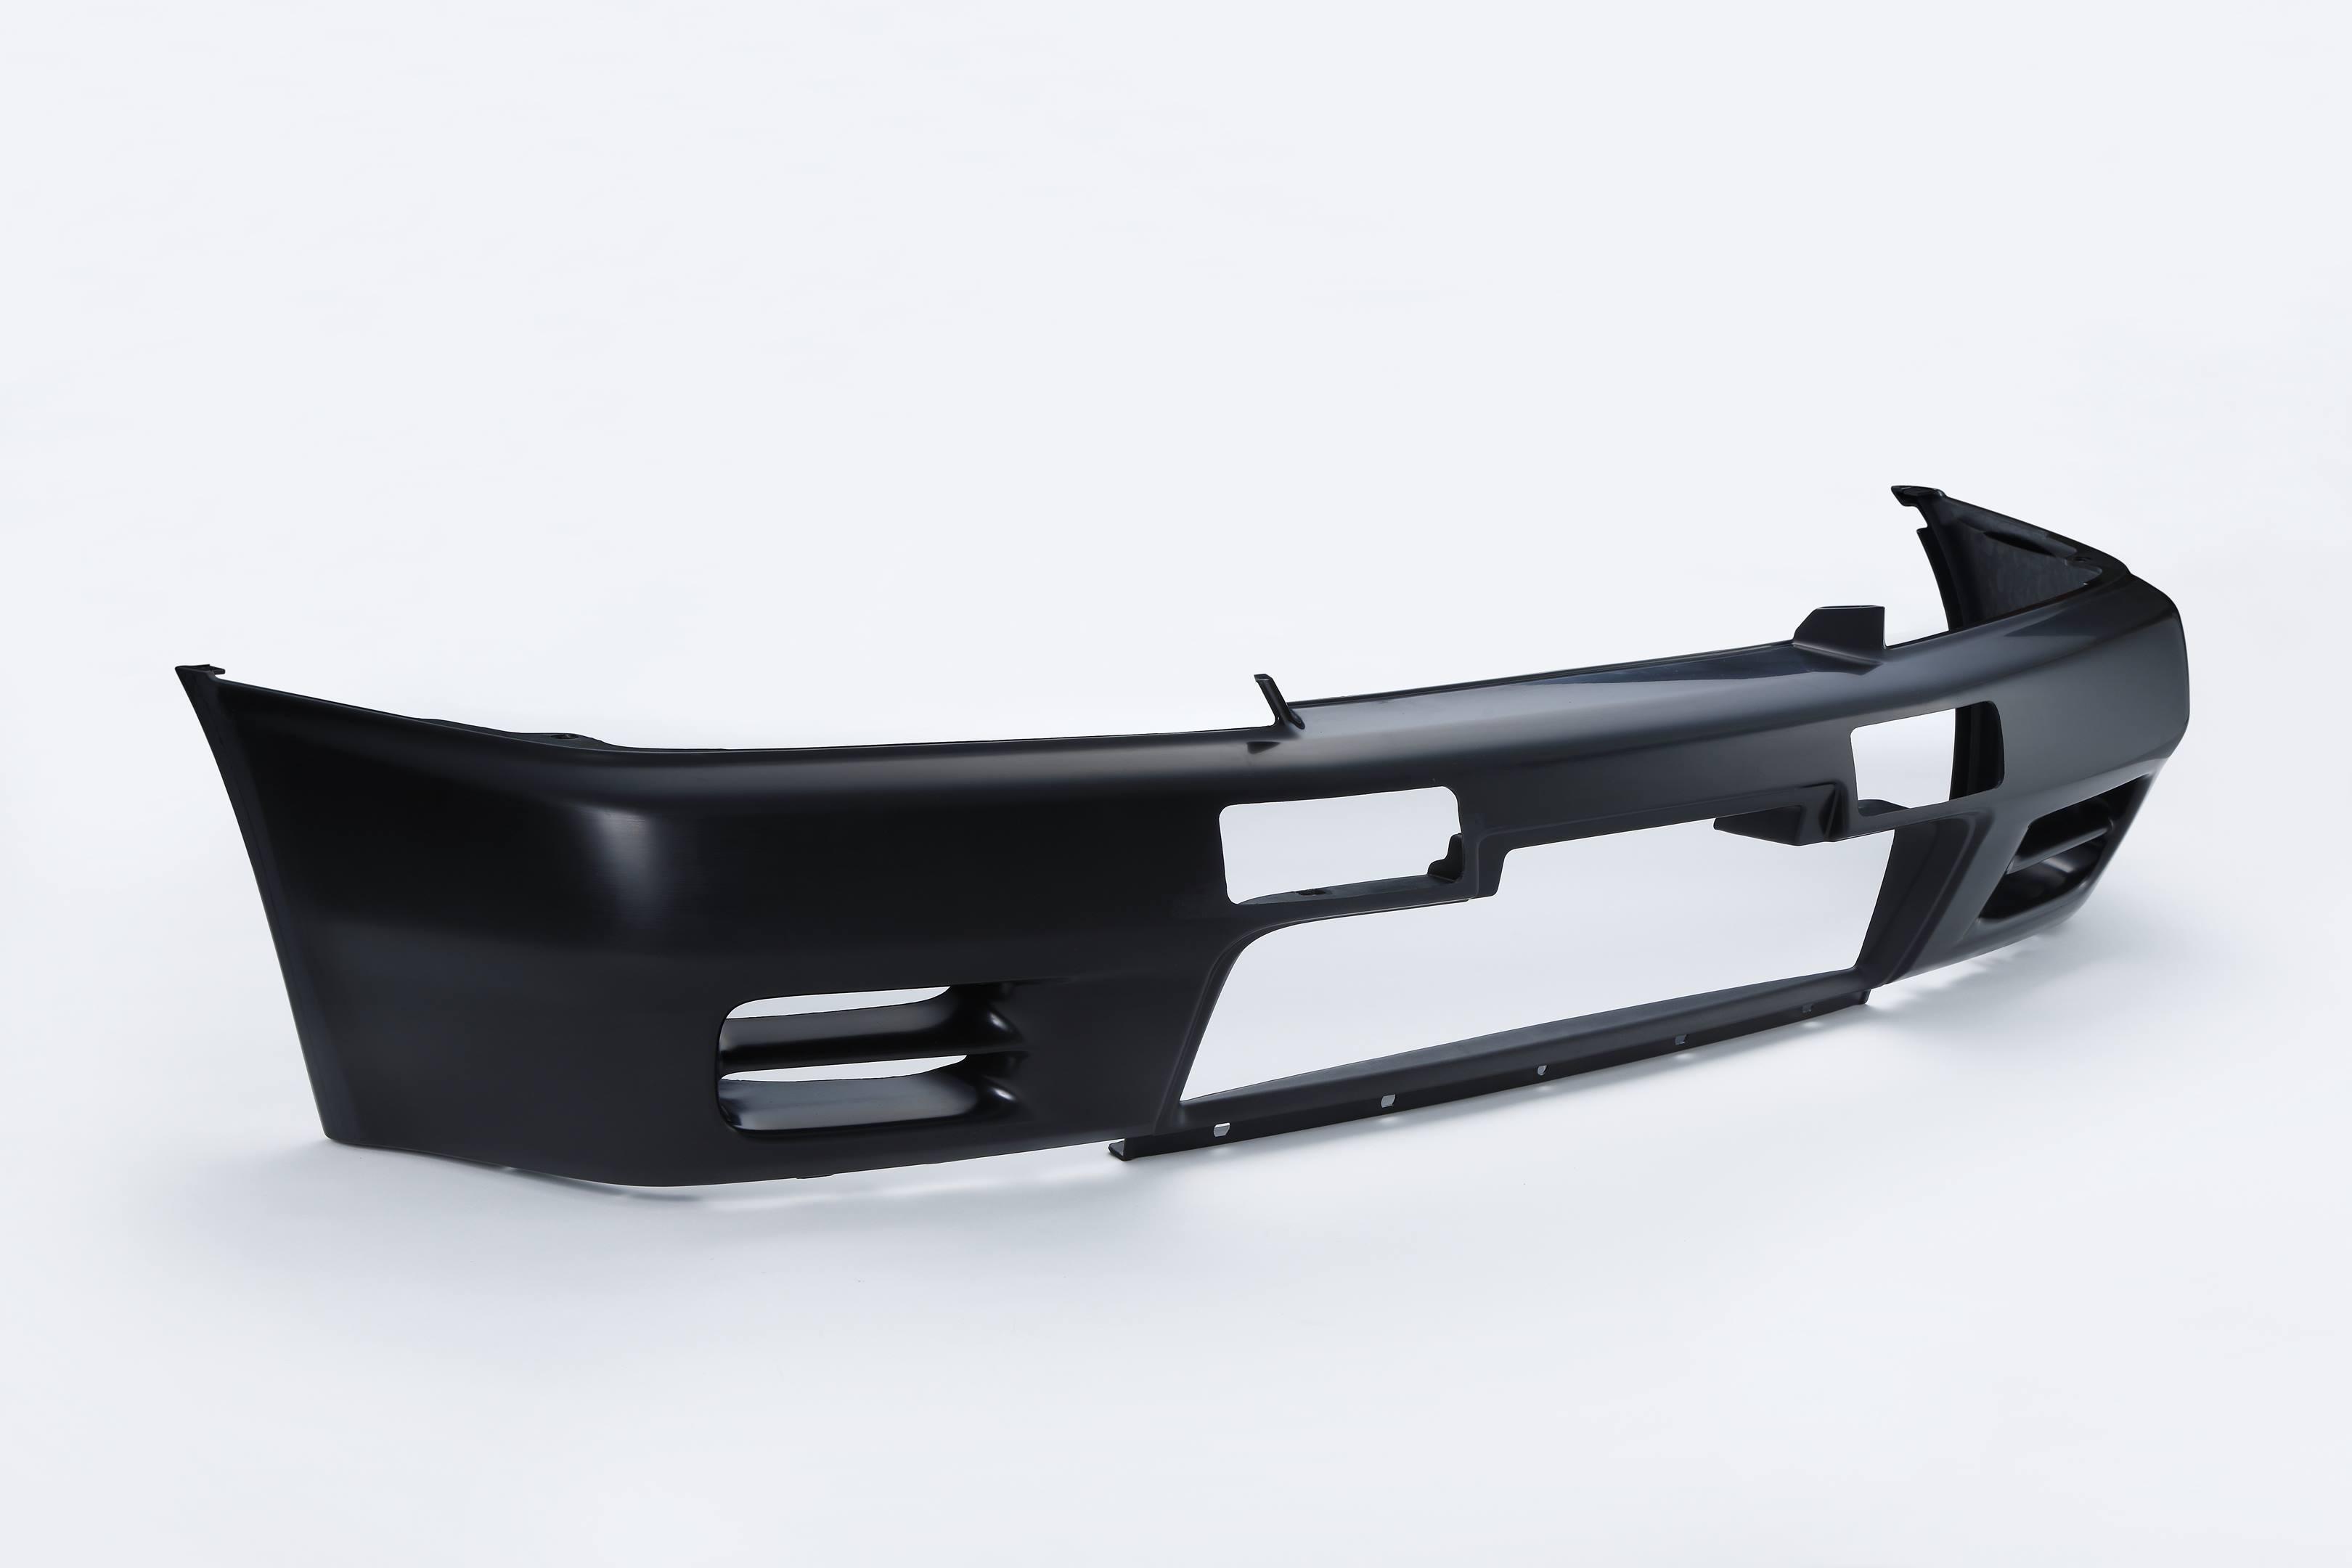 R32 GT-R front bumper